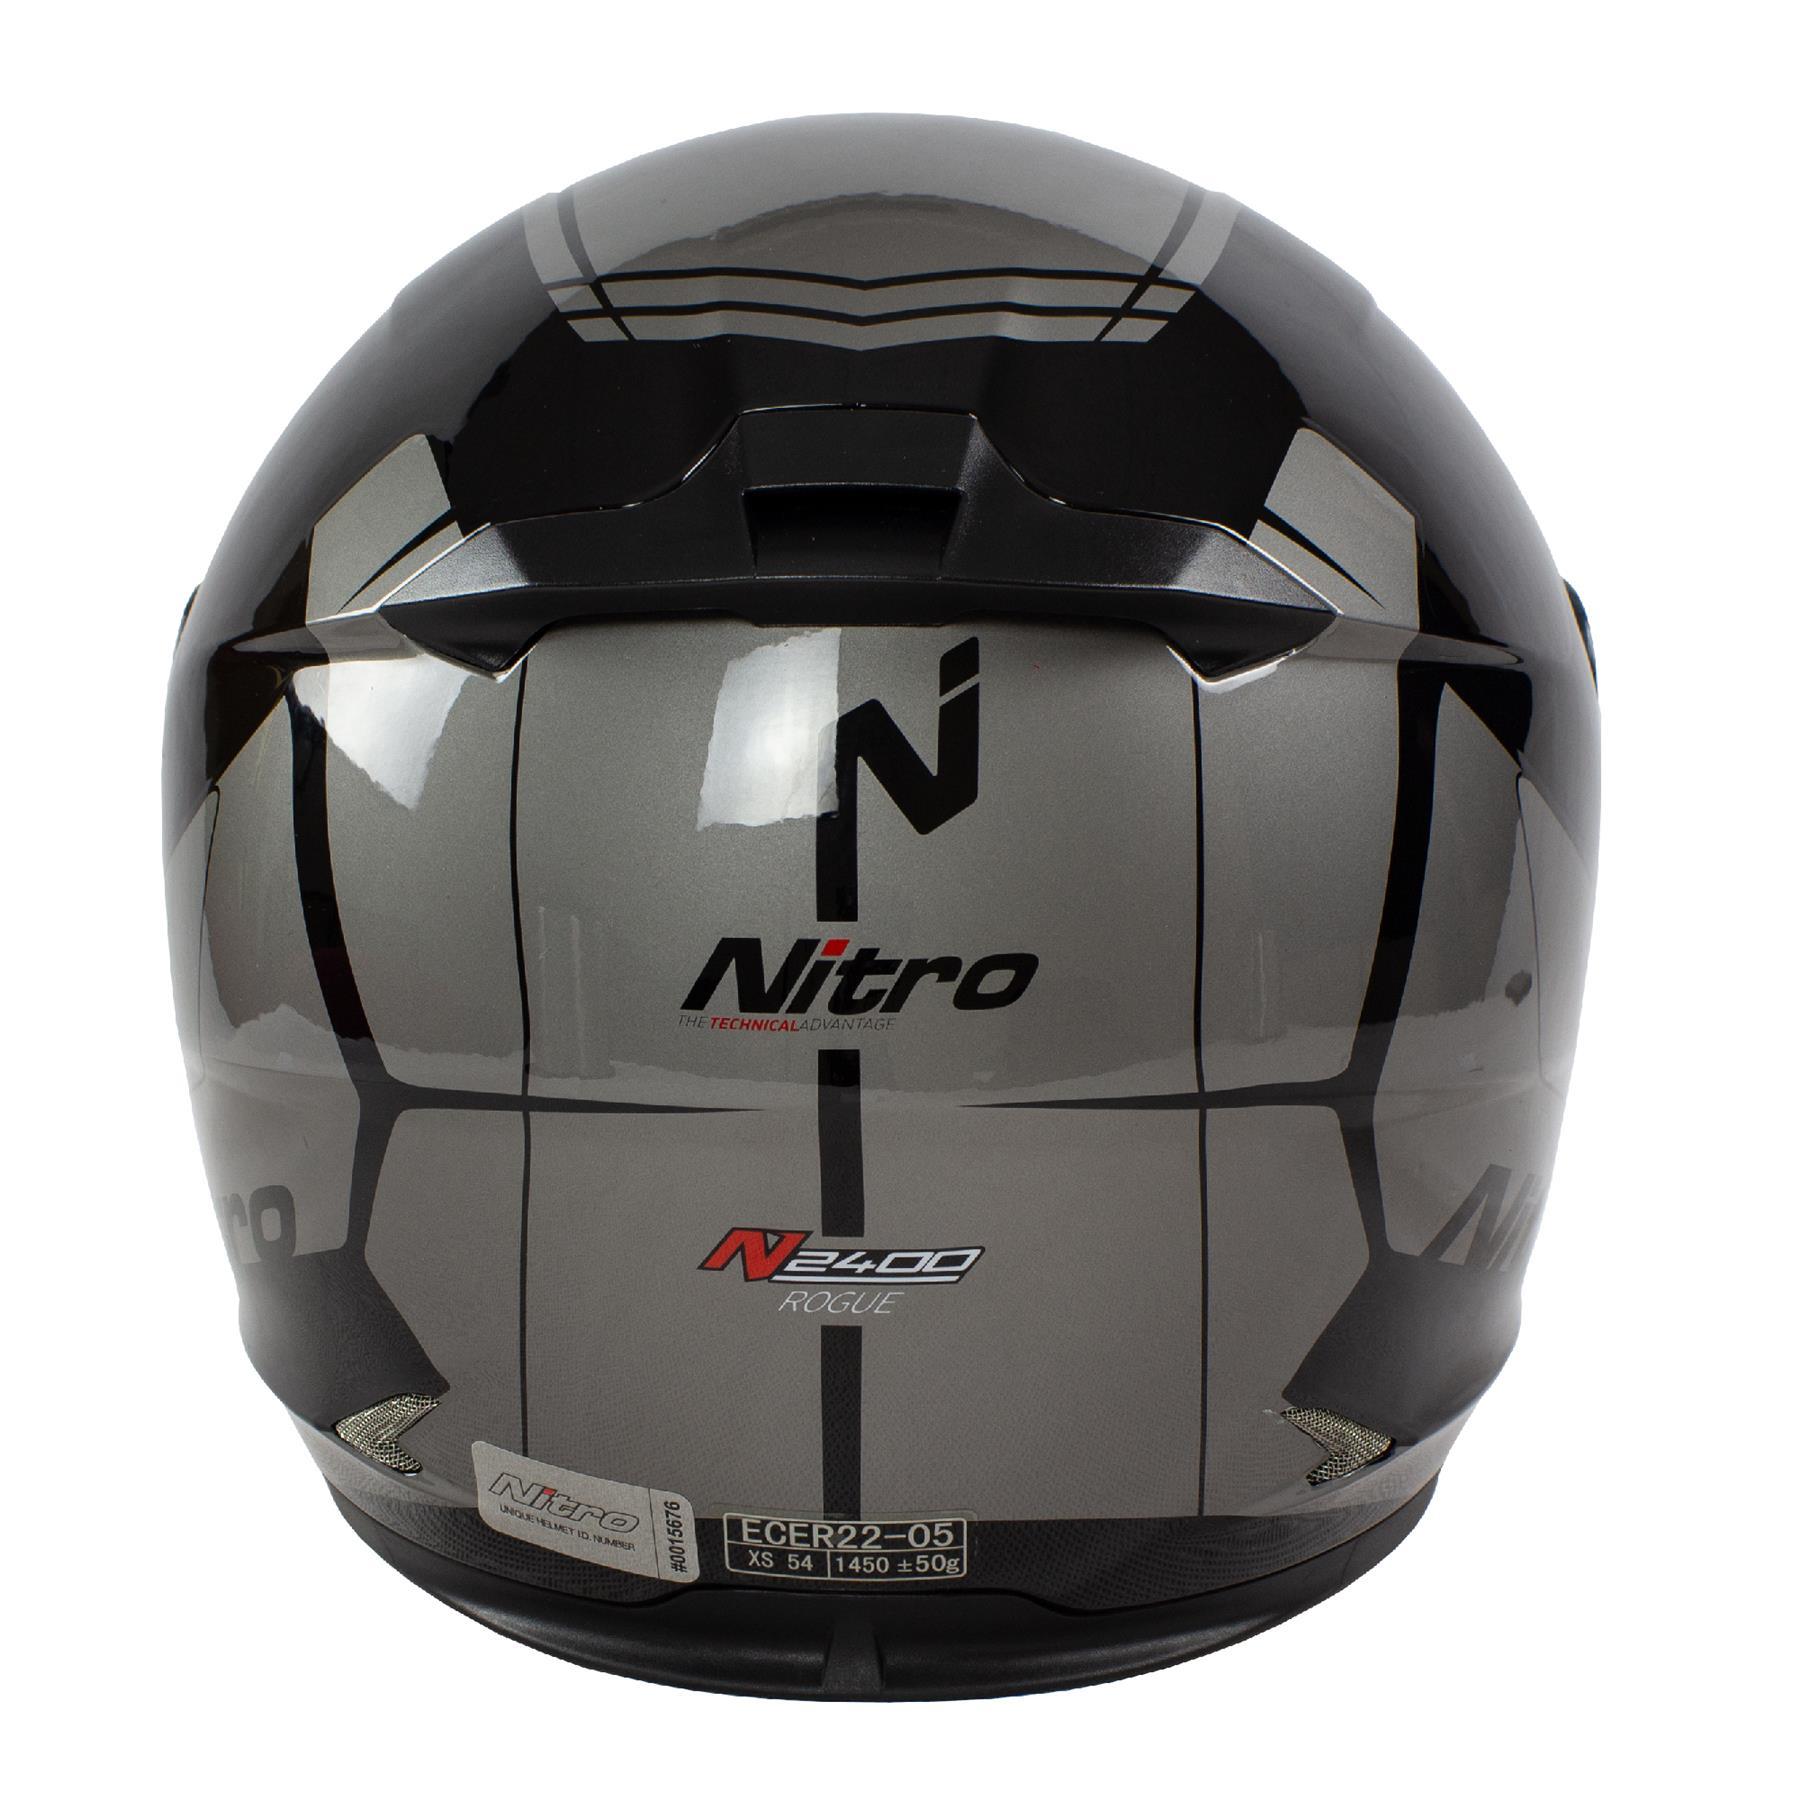 Nitro-N2400-Rogue-Full-Face-Motorcycle-Motorbike-Crash-Helmet-Black-Blue-Red thumbnail 17